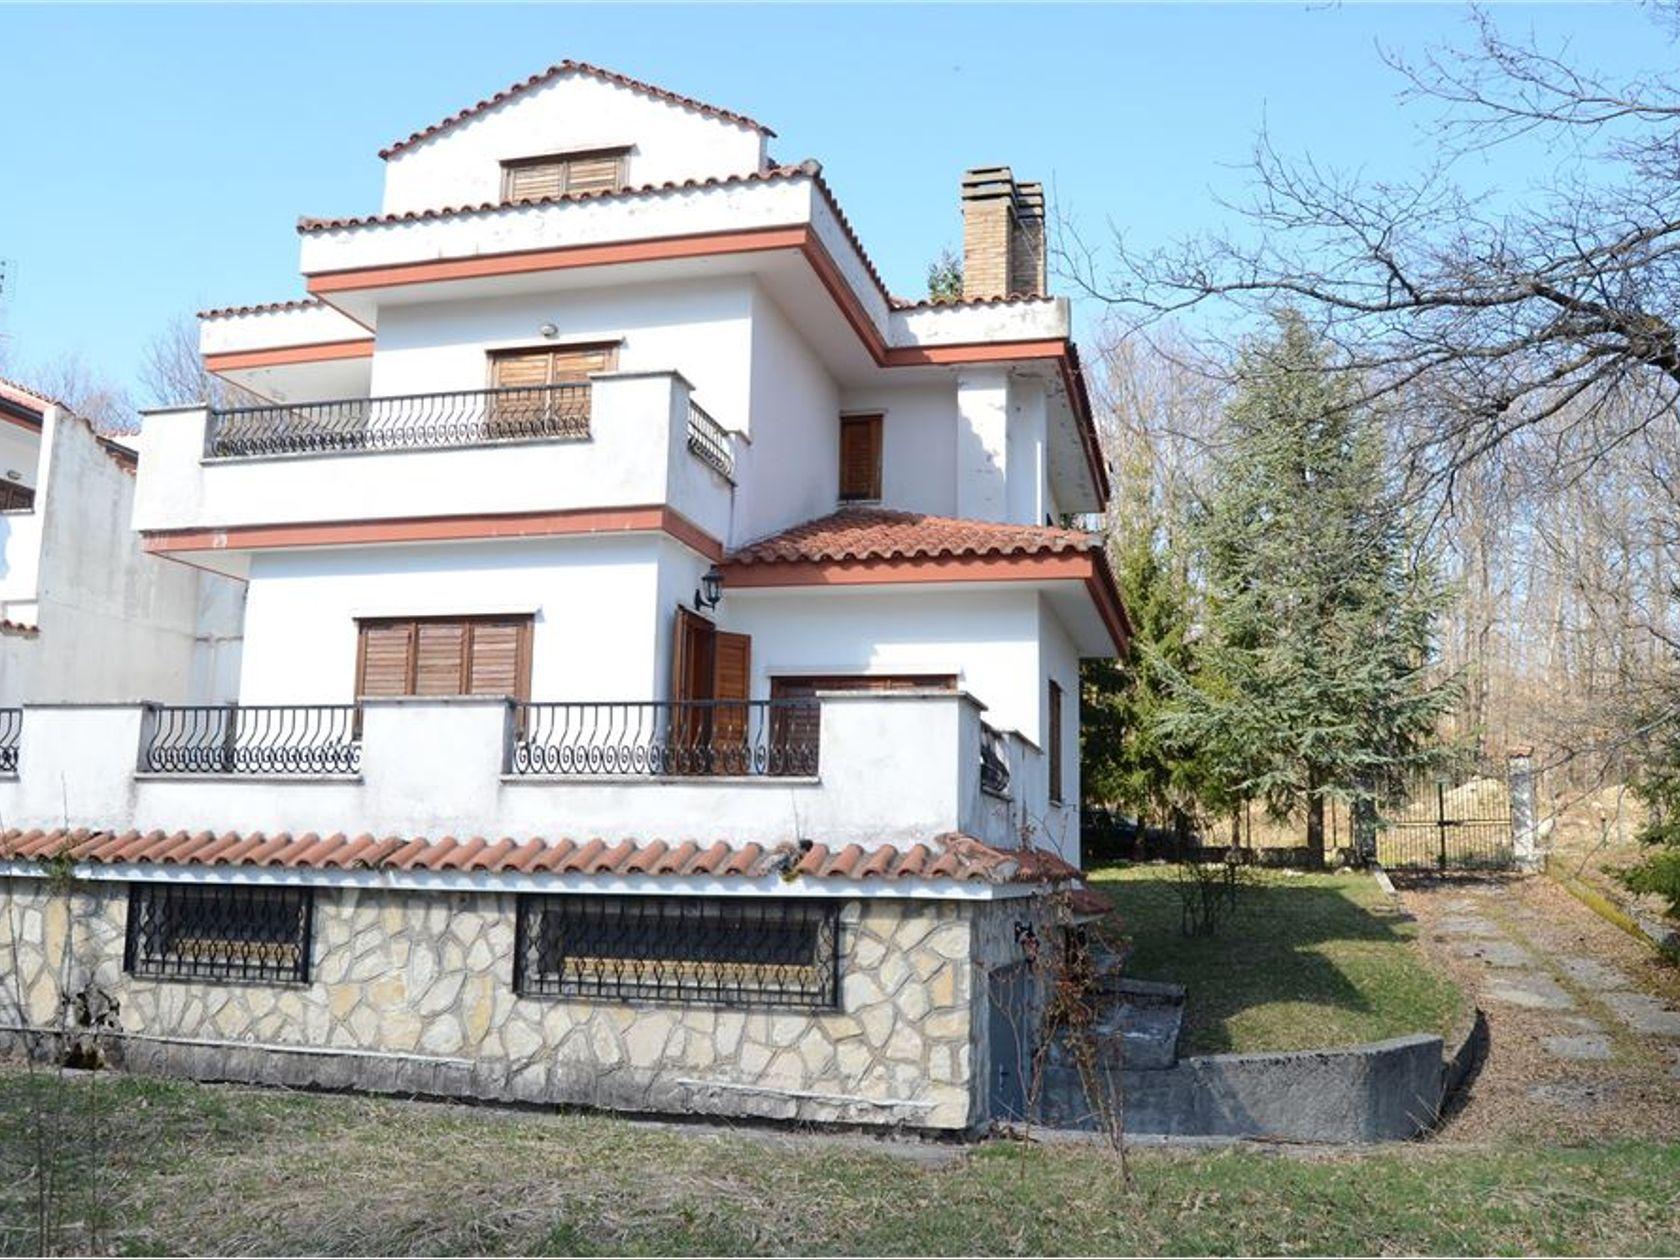 Villa singola Pontone, Castel di Sangro, AQ Vendita